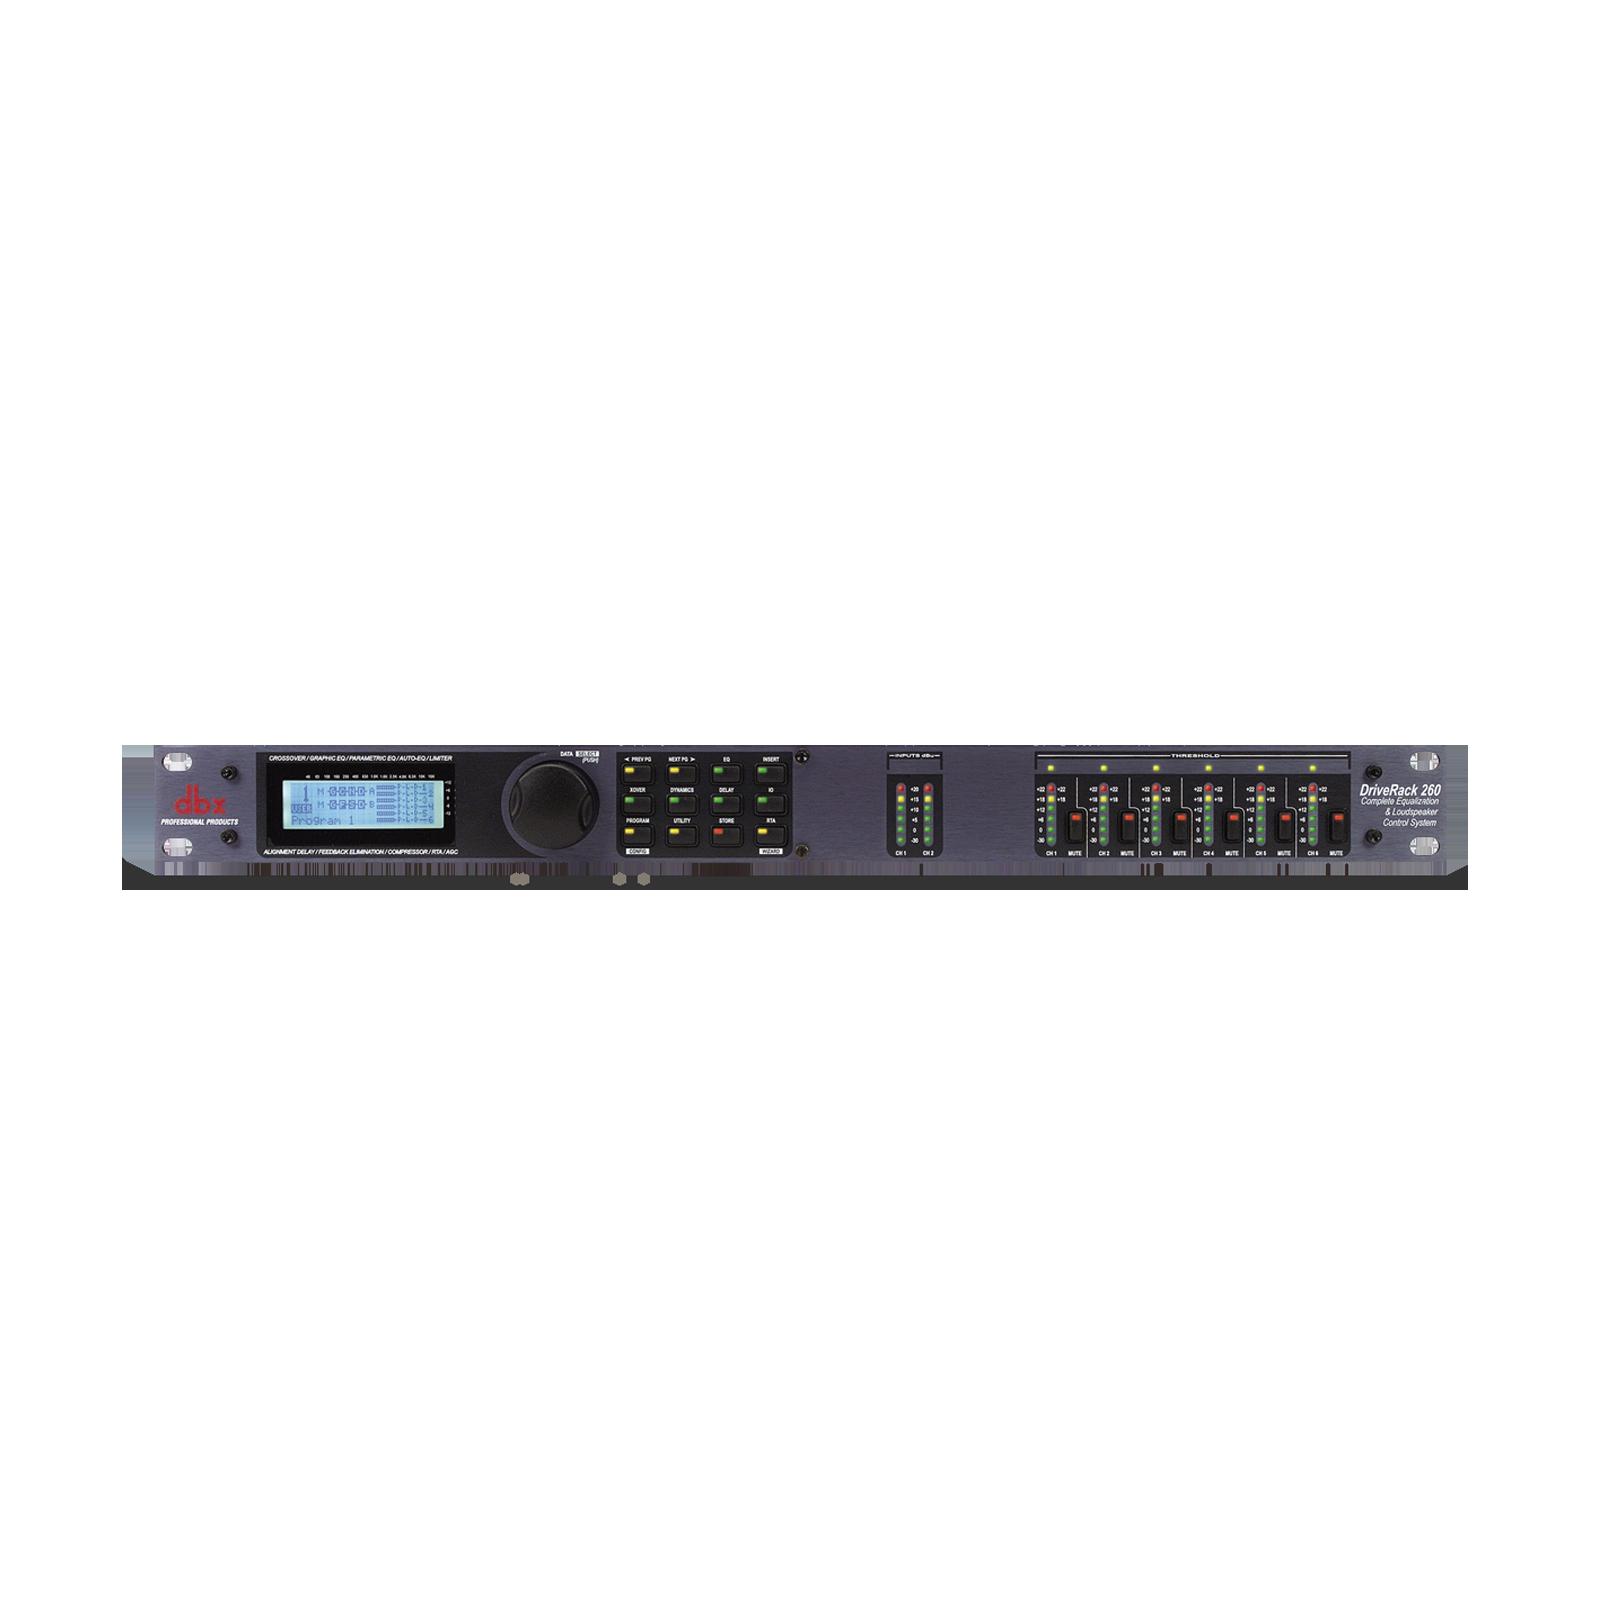 DriveRack 260 - Black - Loudspeaker management system - Hero